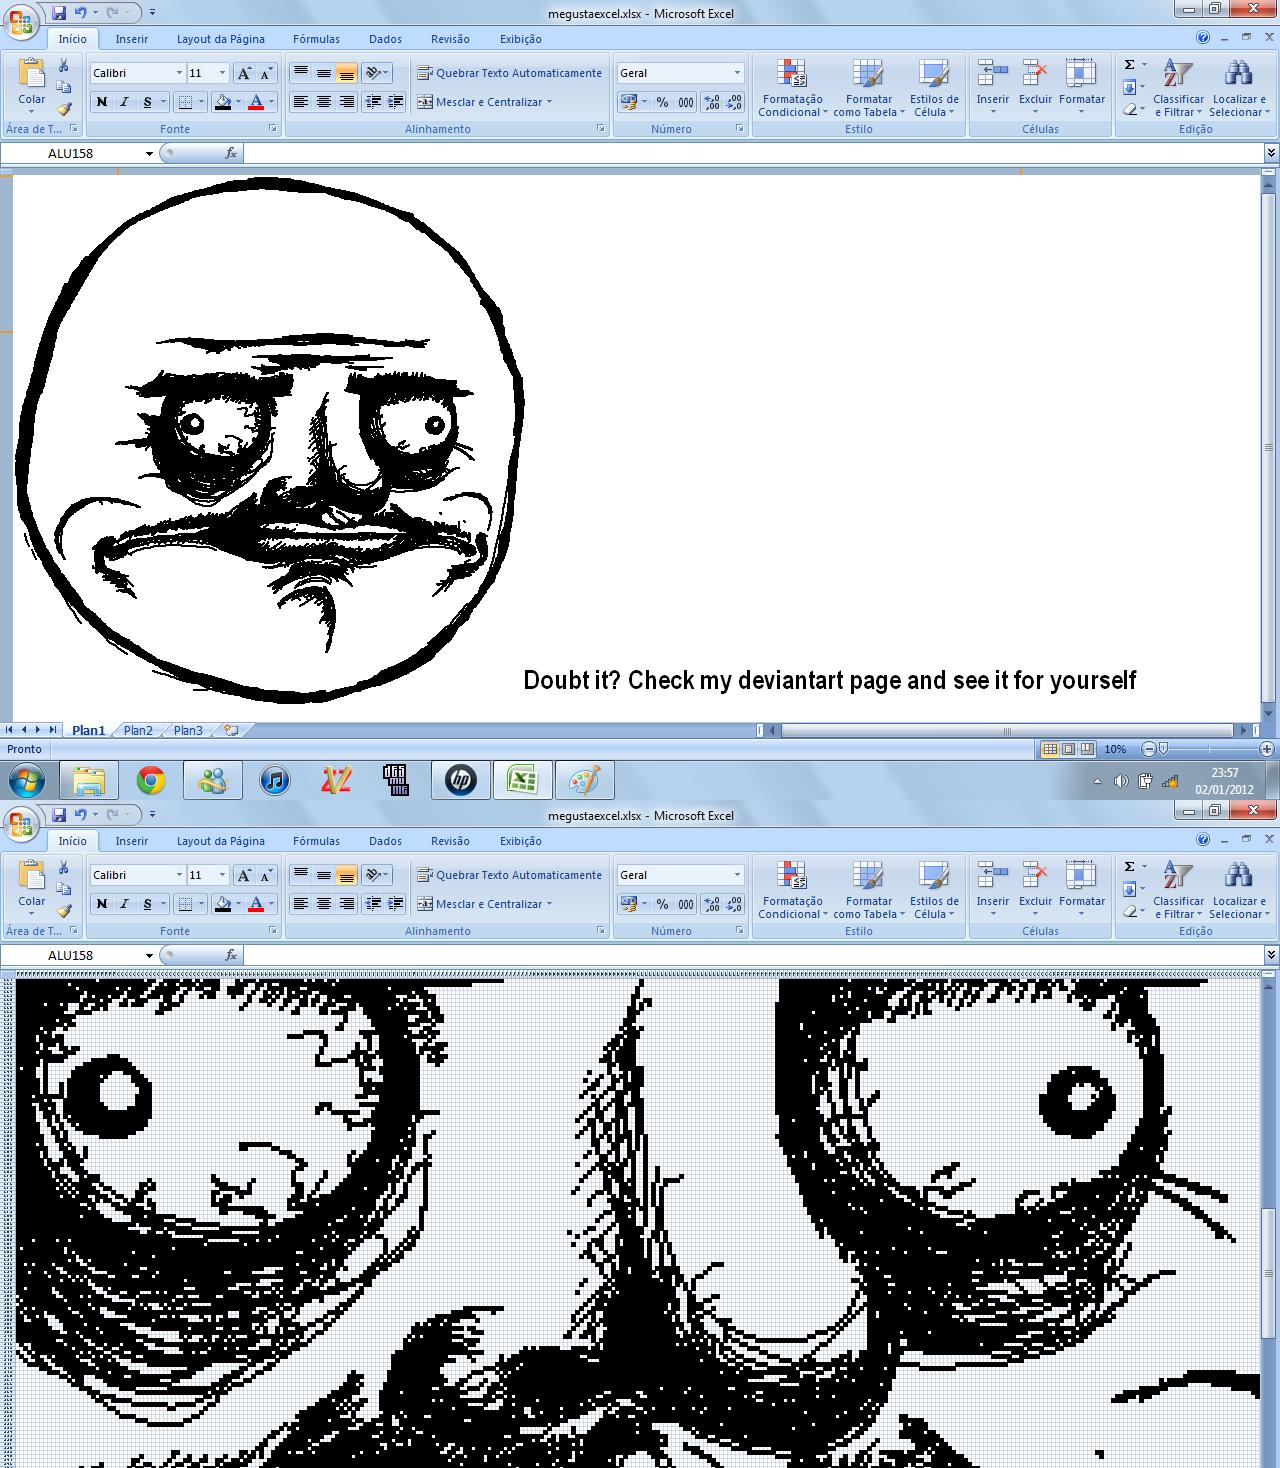 Me Gusta on Excel by thetokomitsu